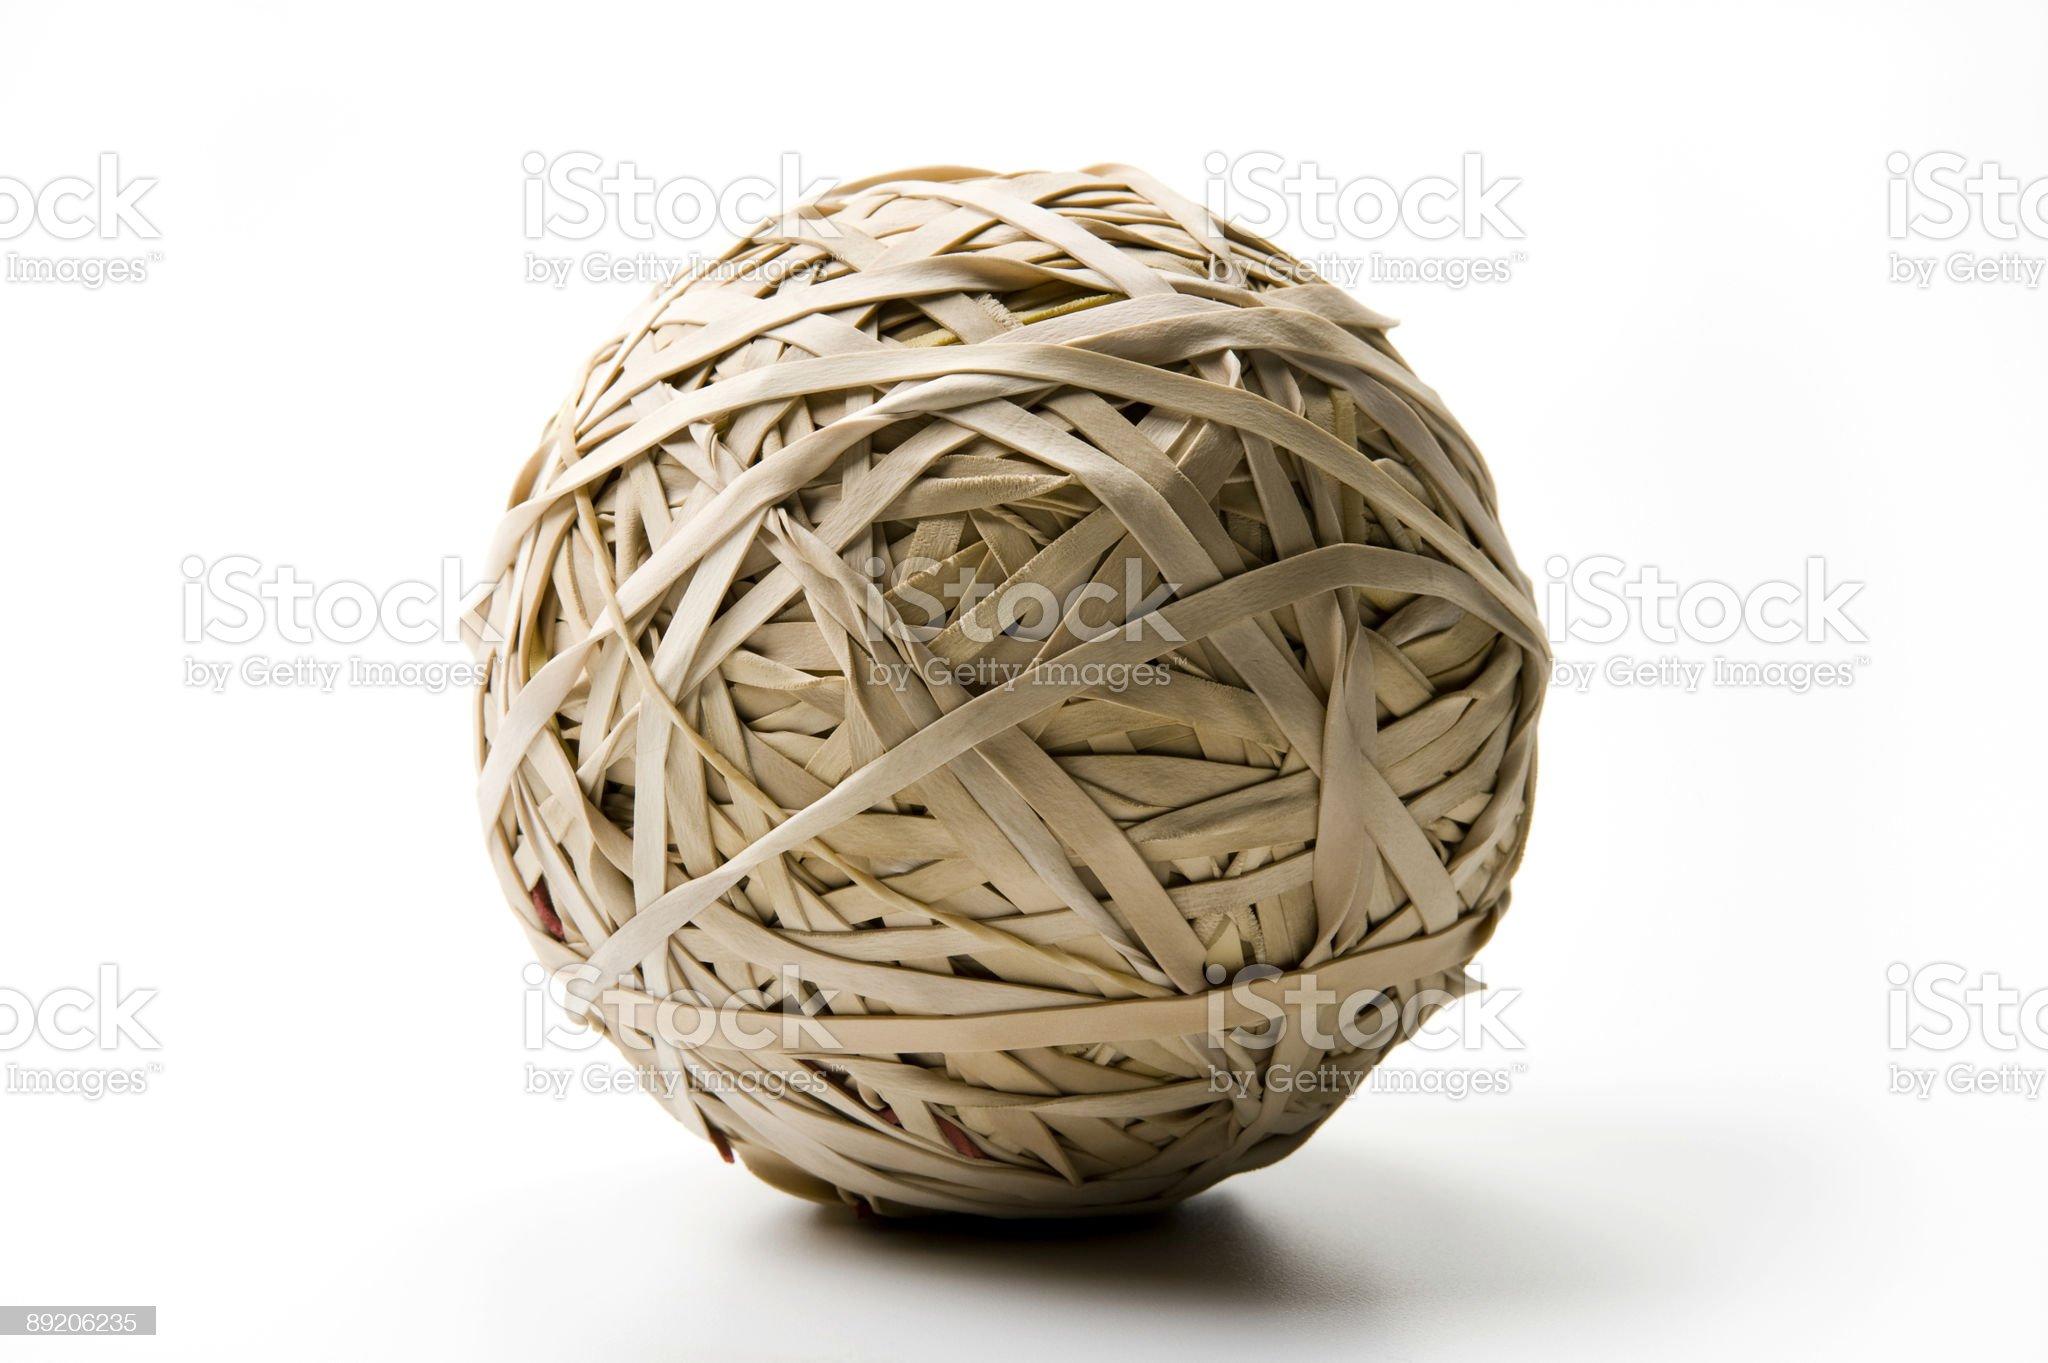 Rubberband Ball royalty-free stock photo